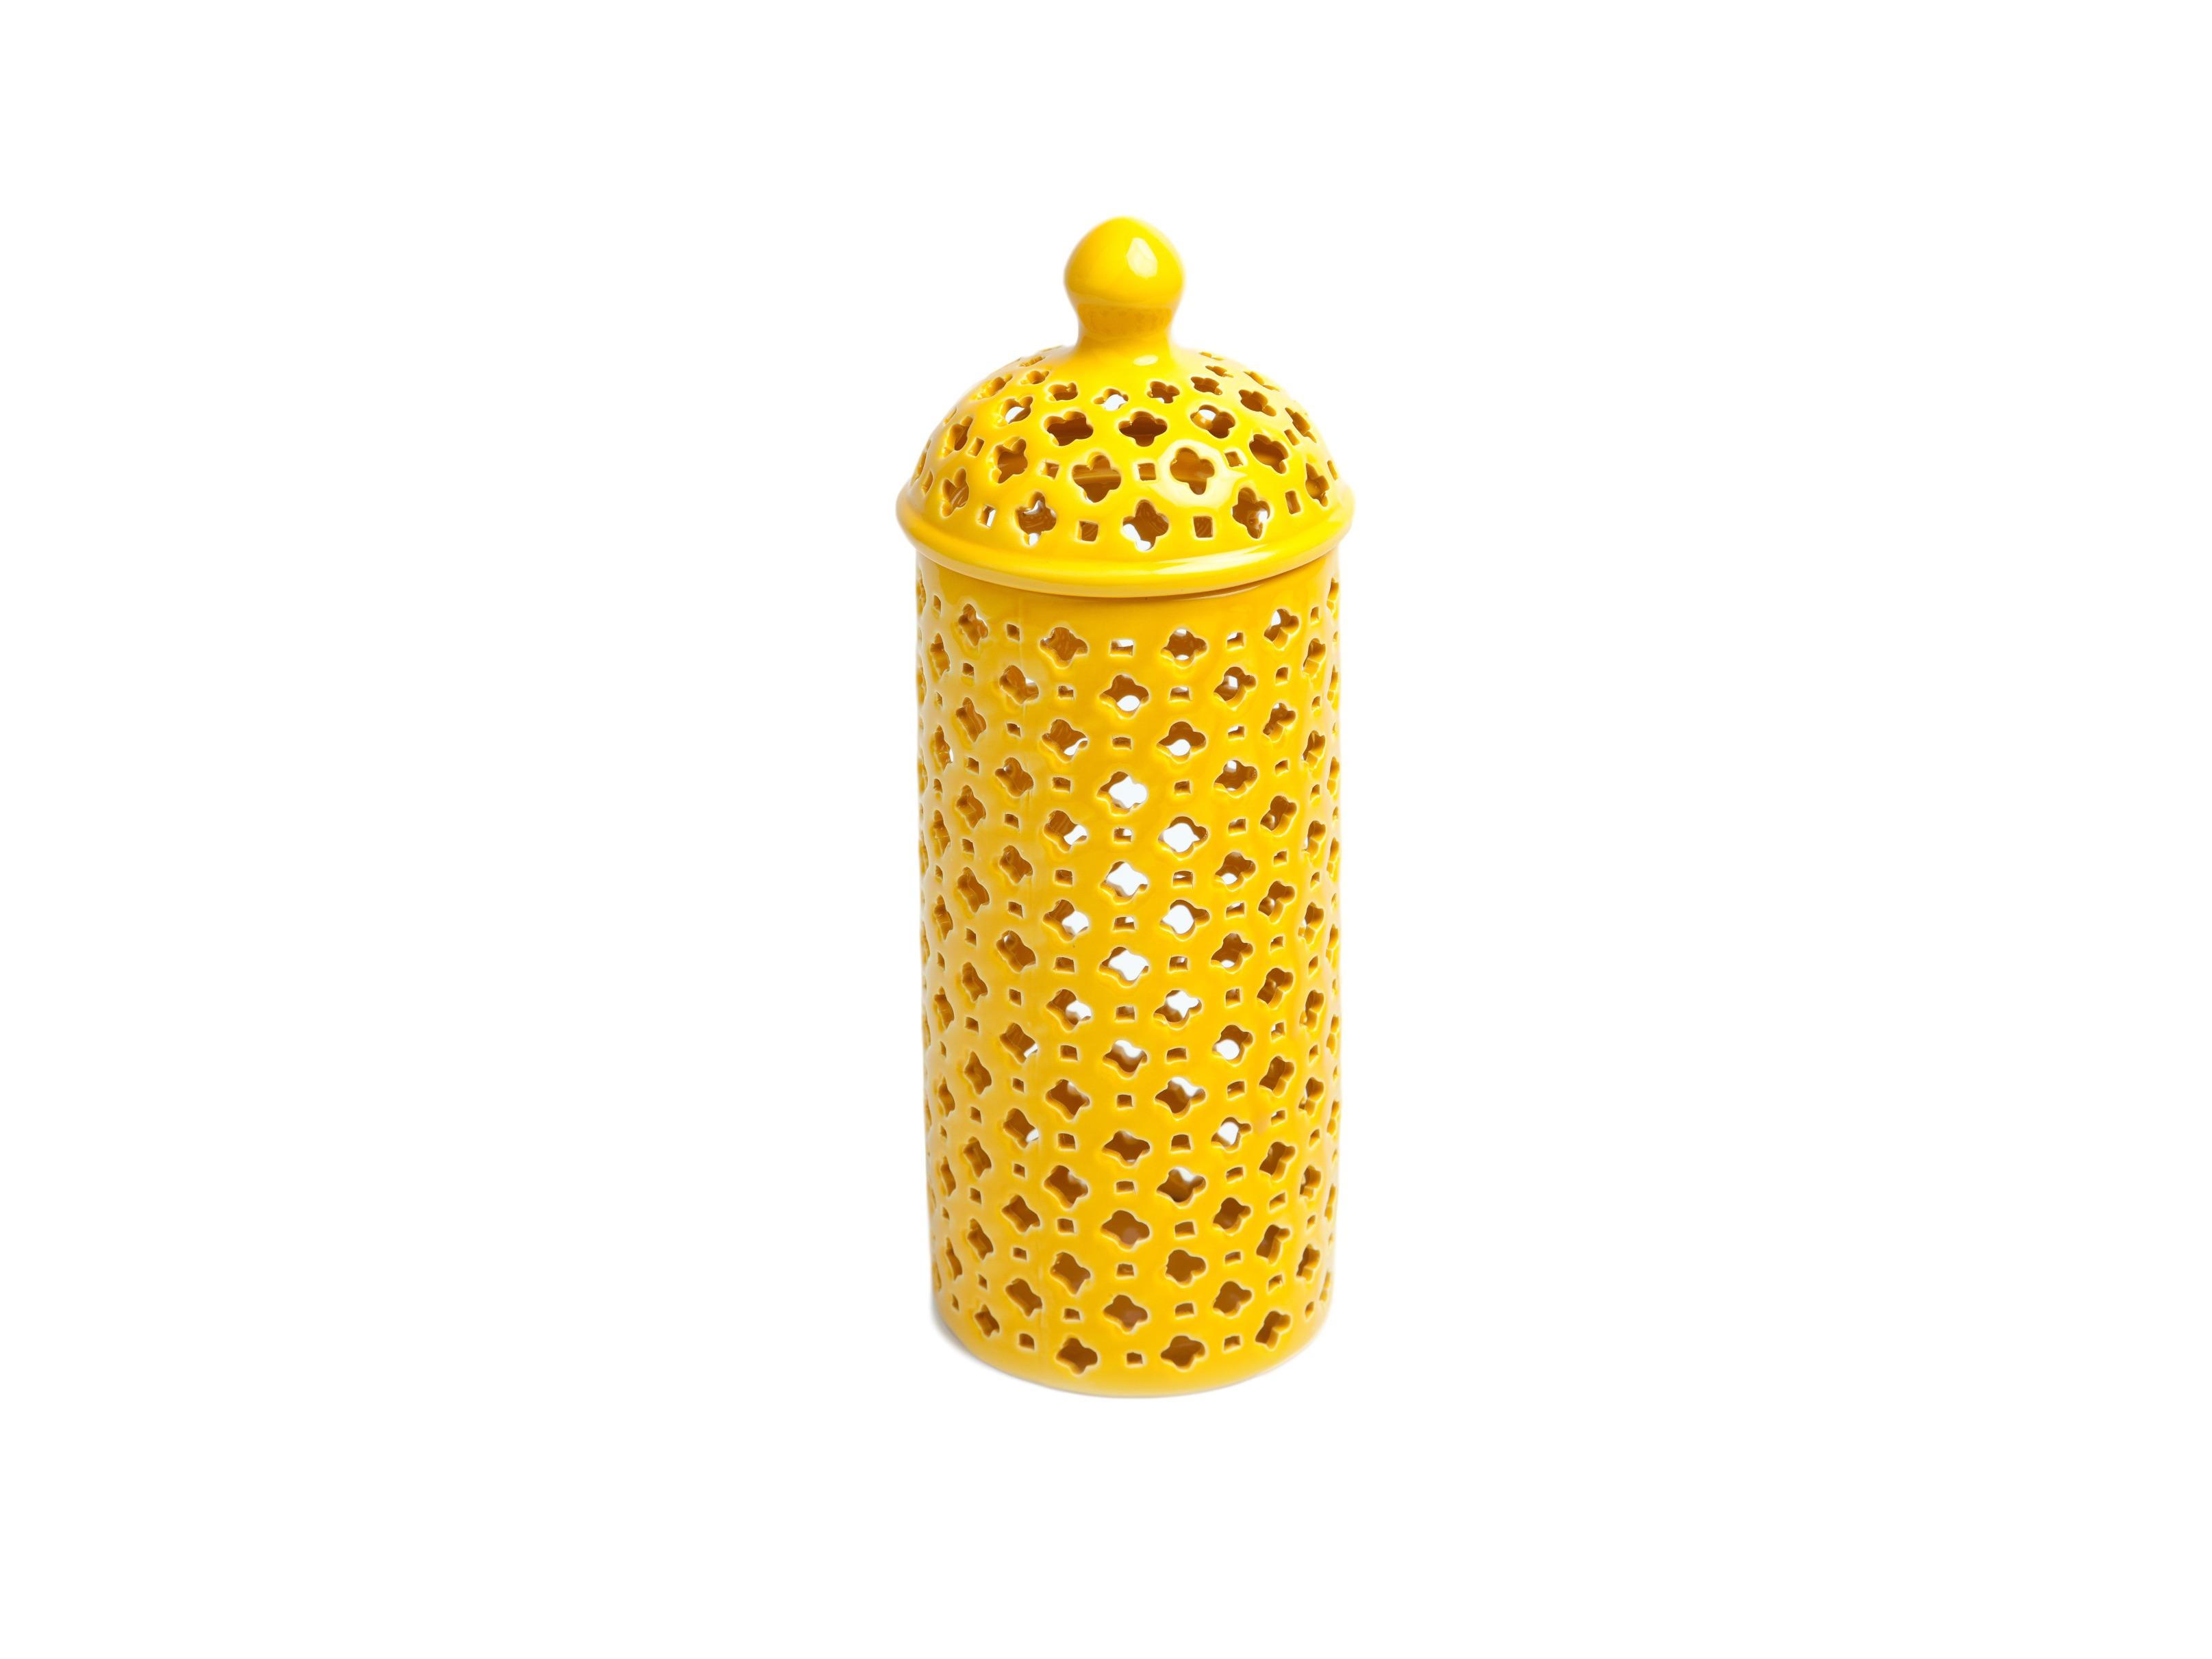 Кувшин декоративныйКувшины и графины<br>Декоративный керамический кувшин с крышкой.<br><br>Material: Керамика<br>Height см: 35<br>Diameter см: 14